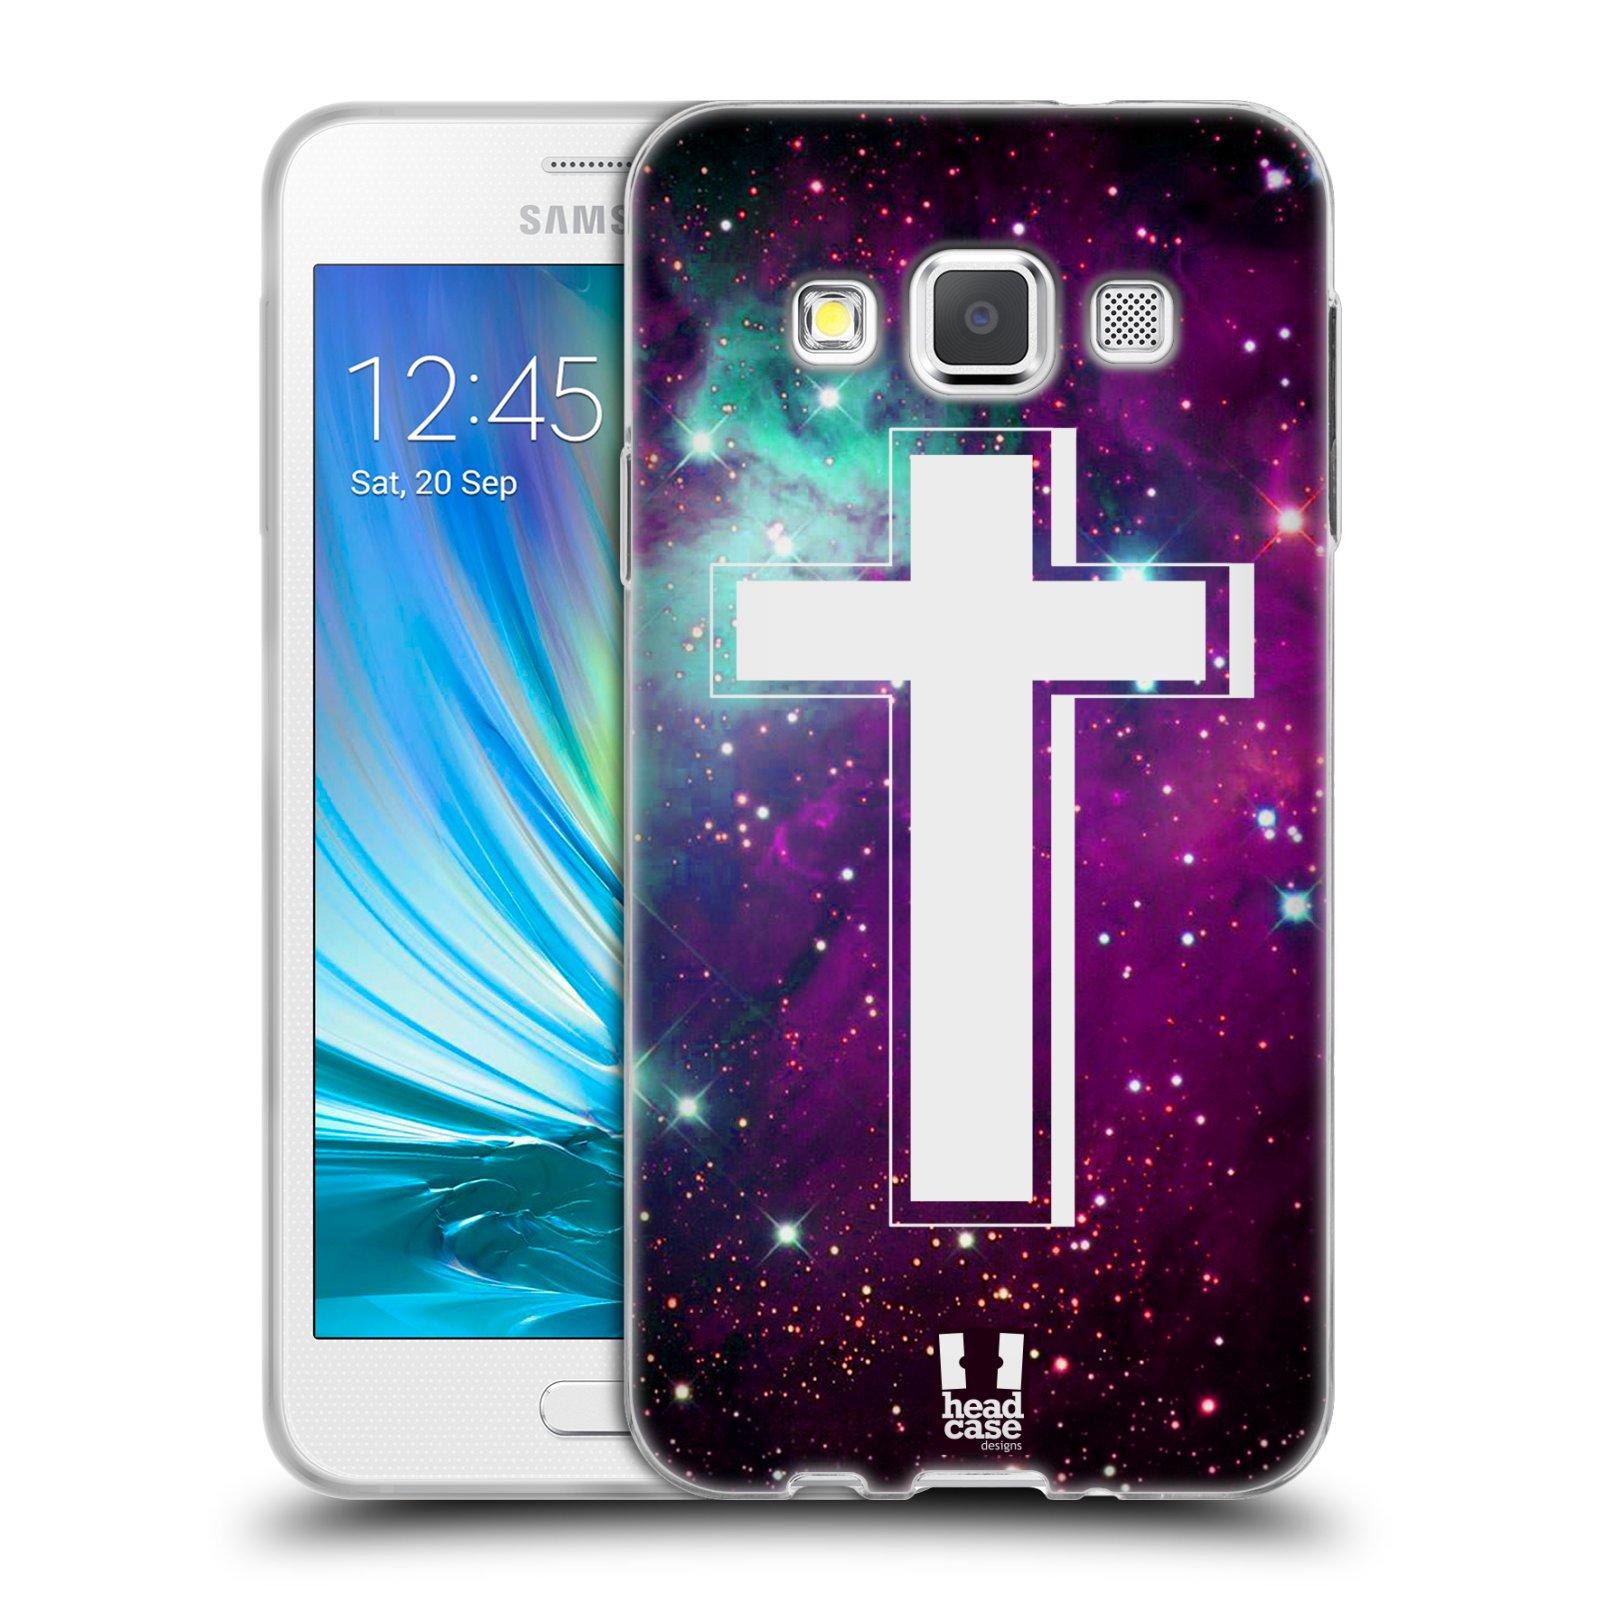 HEAD CASE silikonový obal na mobil Samsung Galaxy A3 vzor Kříž Cross MLHOVINA FIALOVÁ